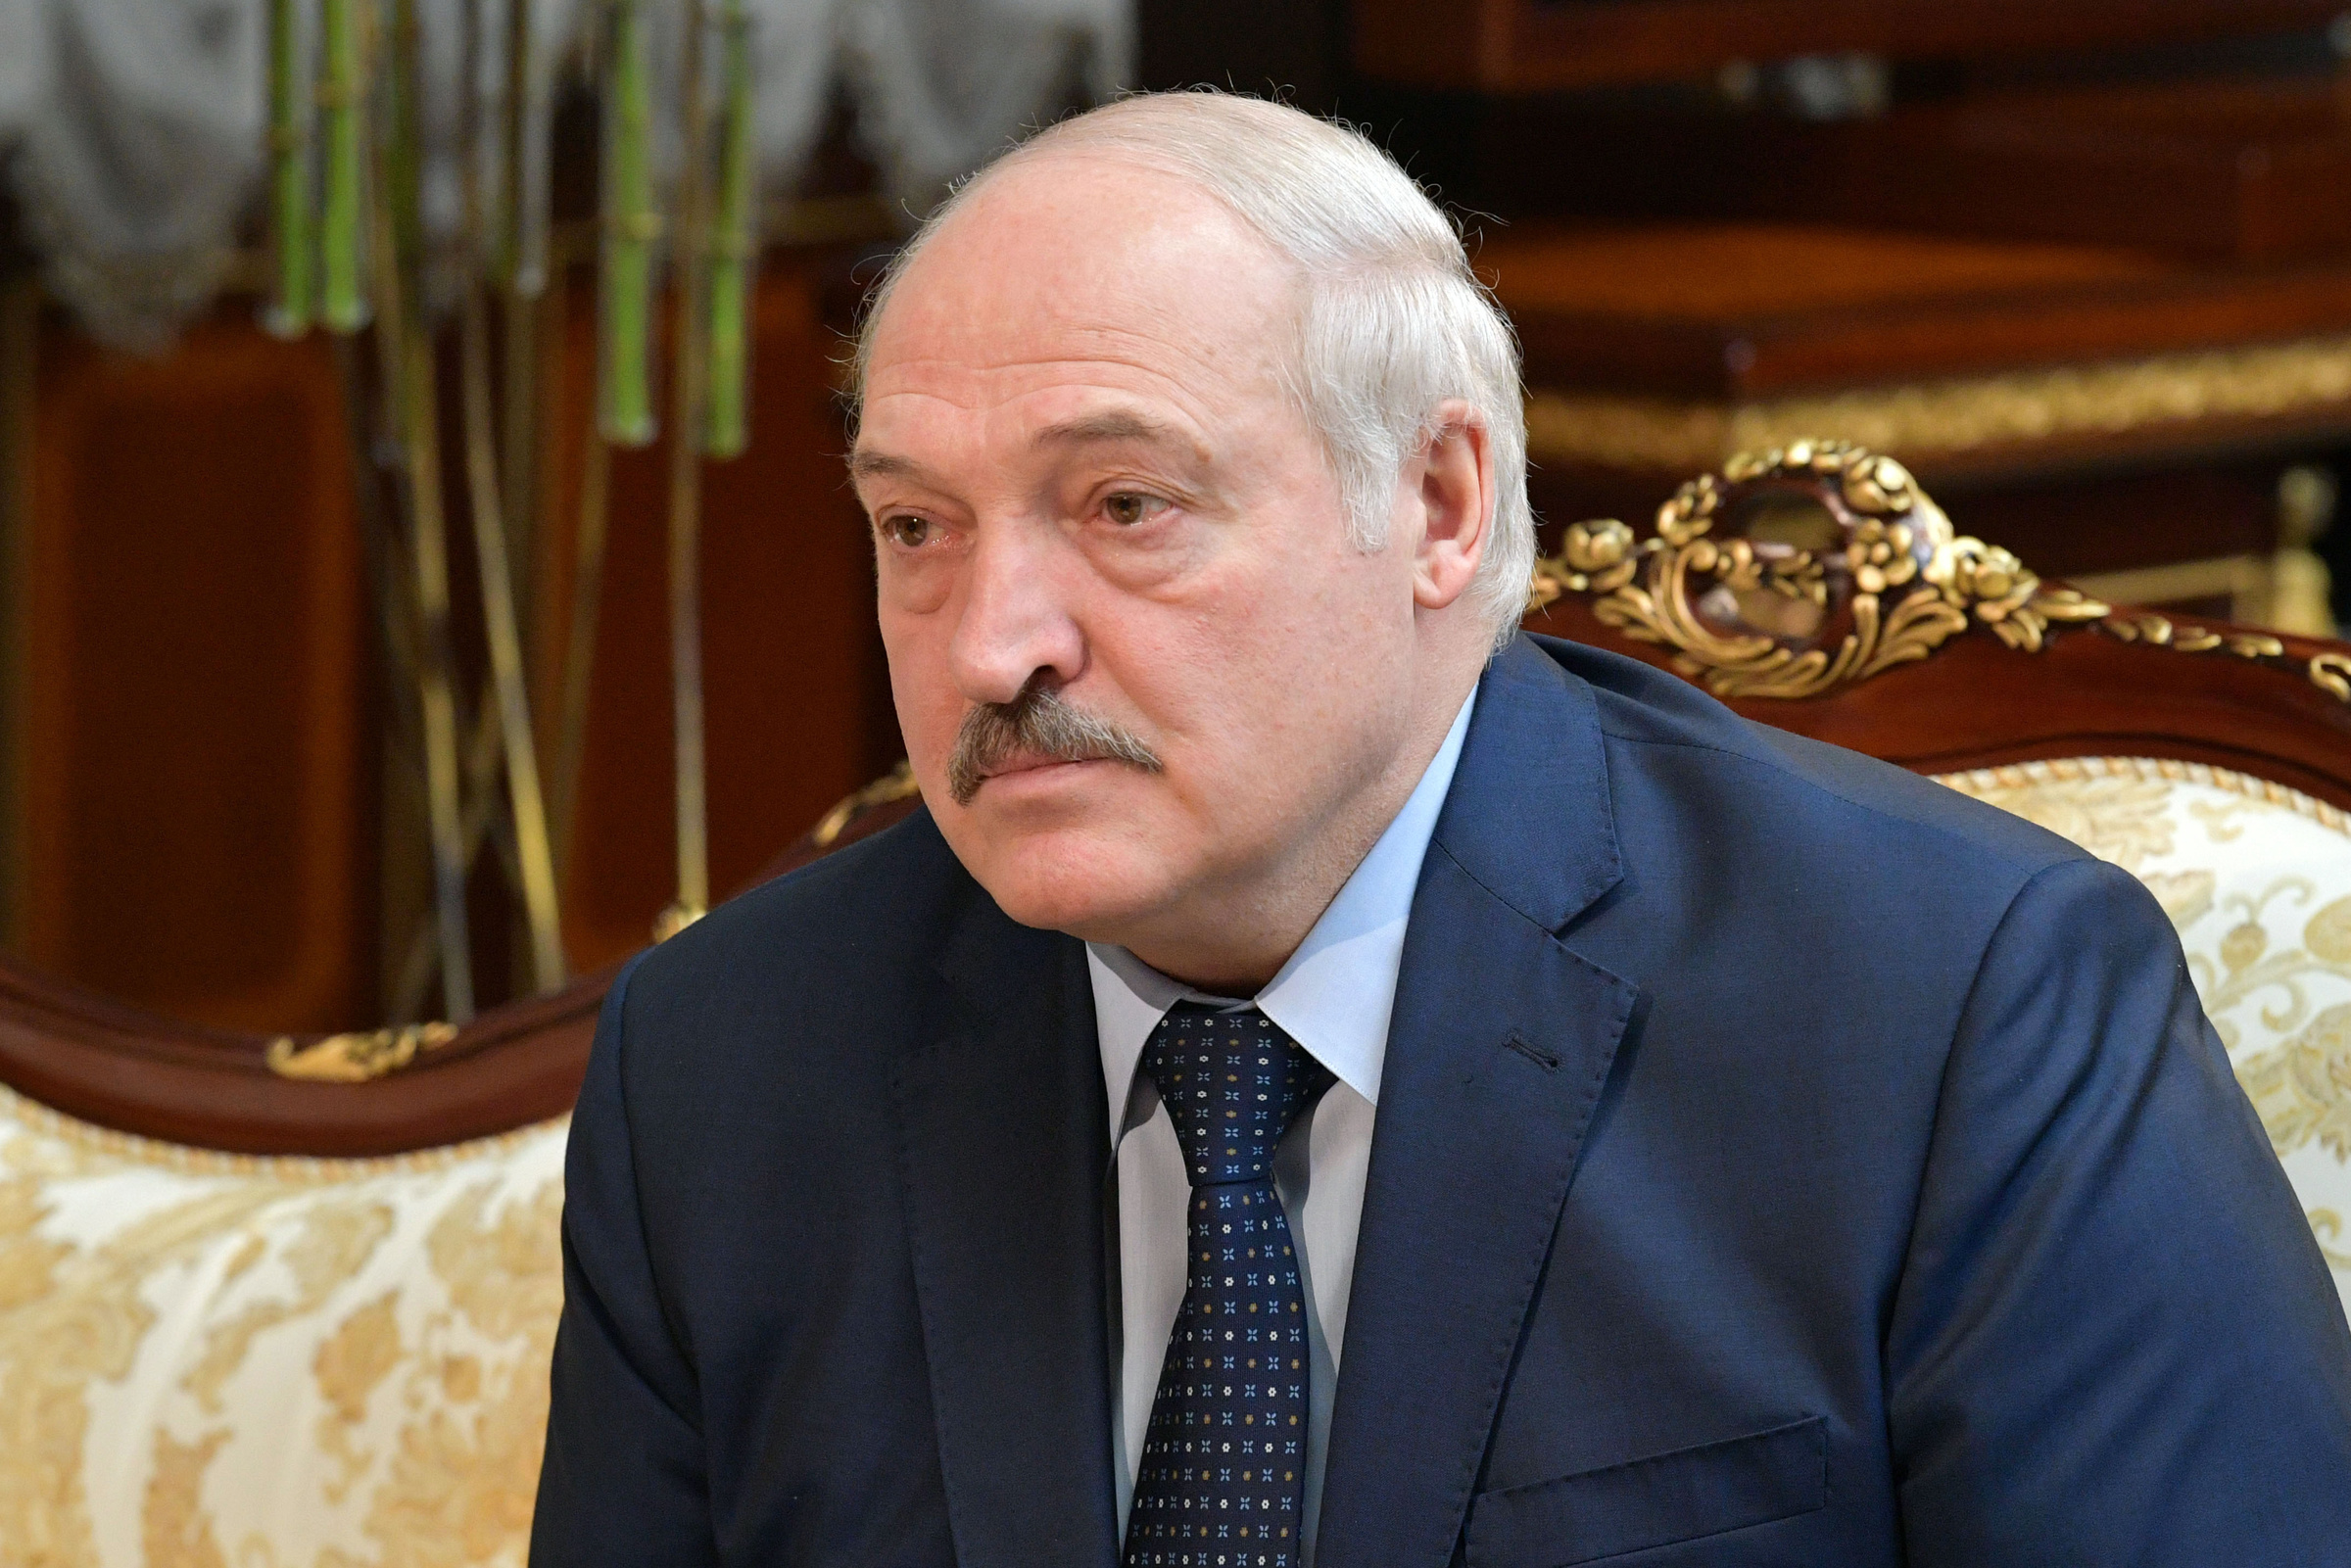 <p>Президент Белоруссии Александр Лукашенко. Фото © Александр Астафьев / POOL / ТАСС</p>